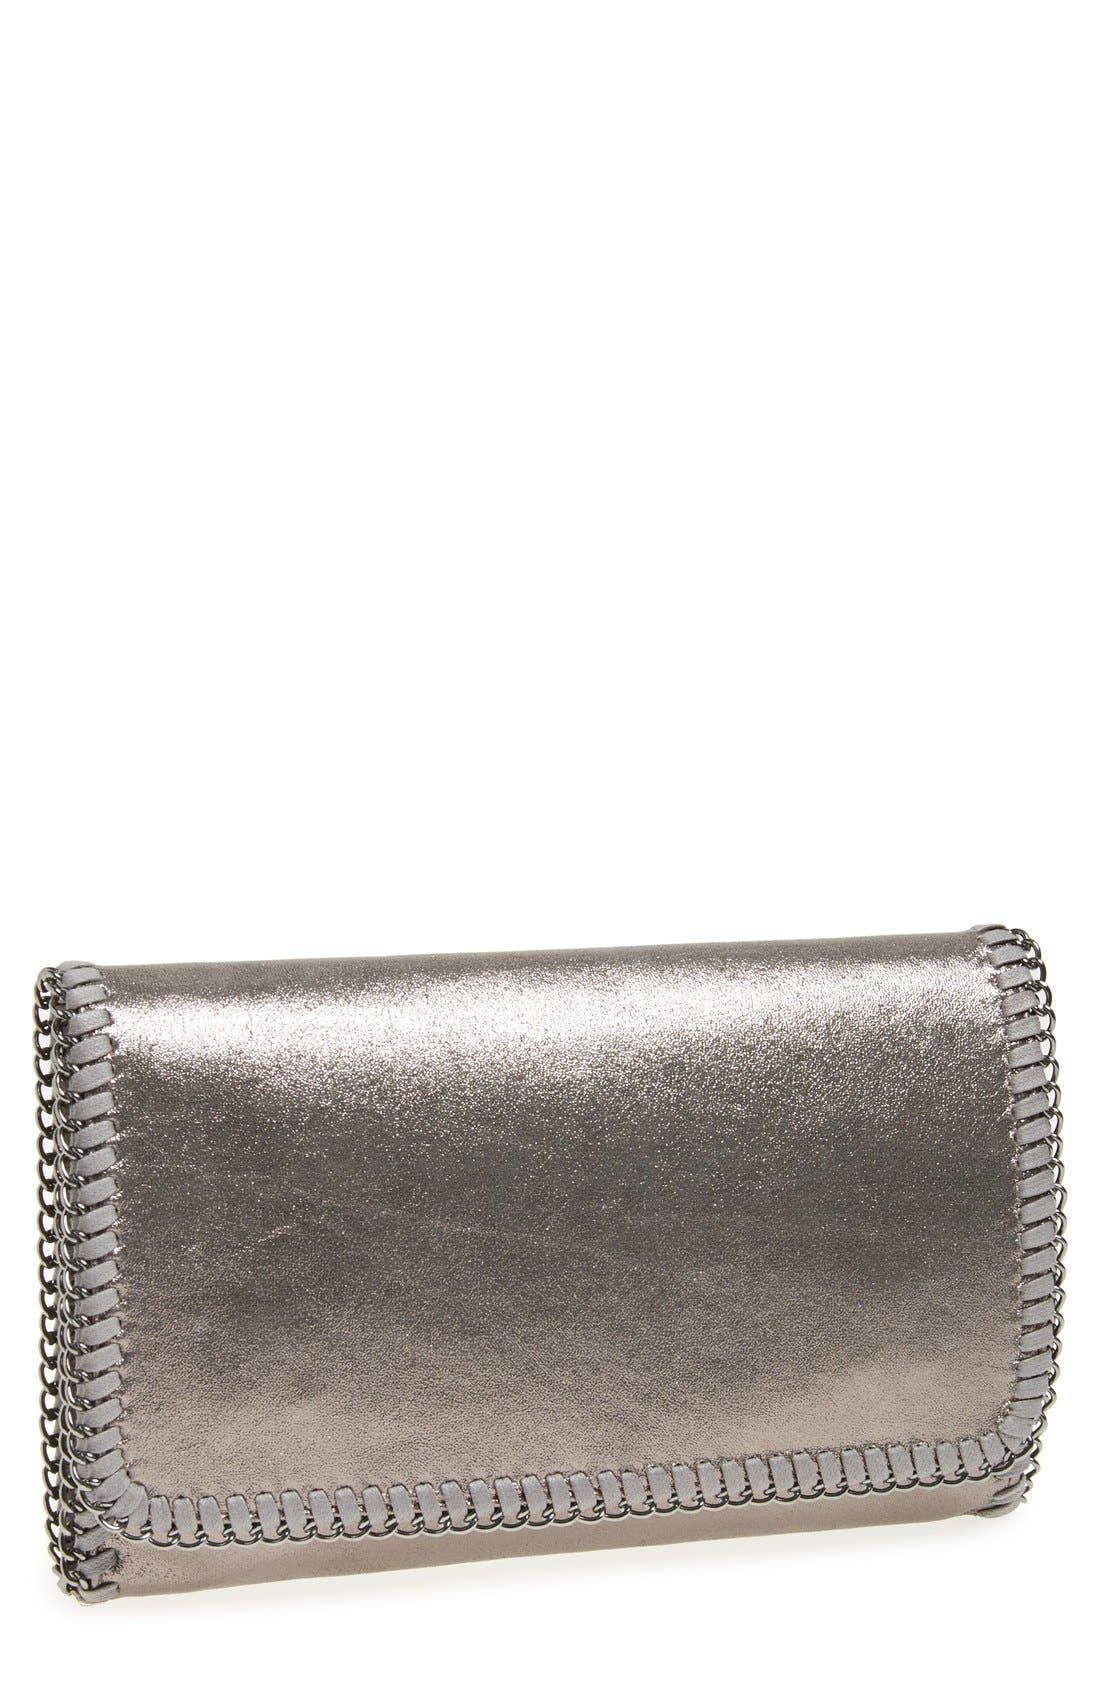 Main Image - Phase 3 'Metallic Chain' Foldover Clutch